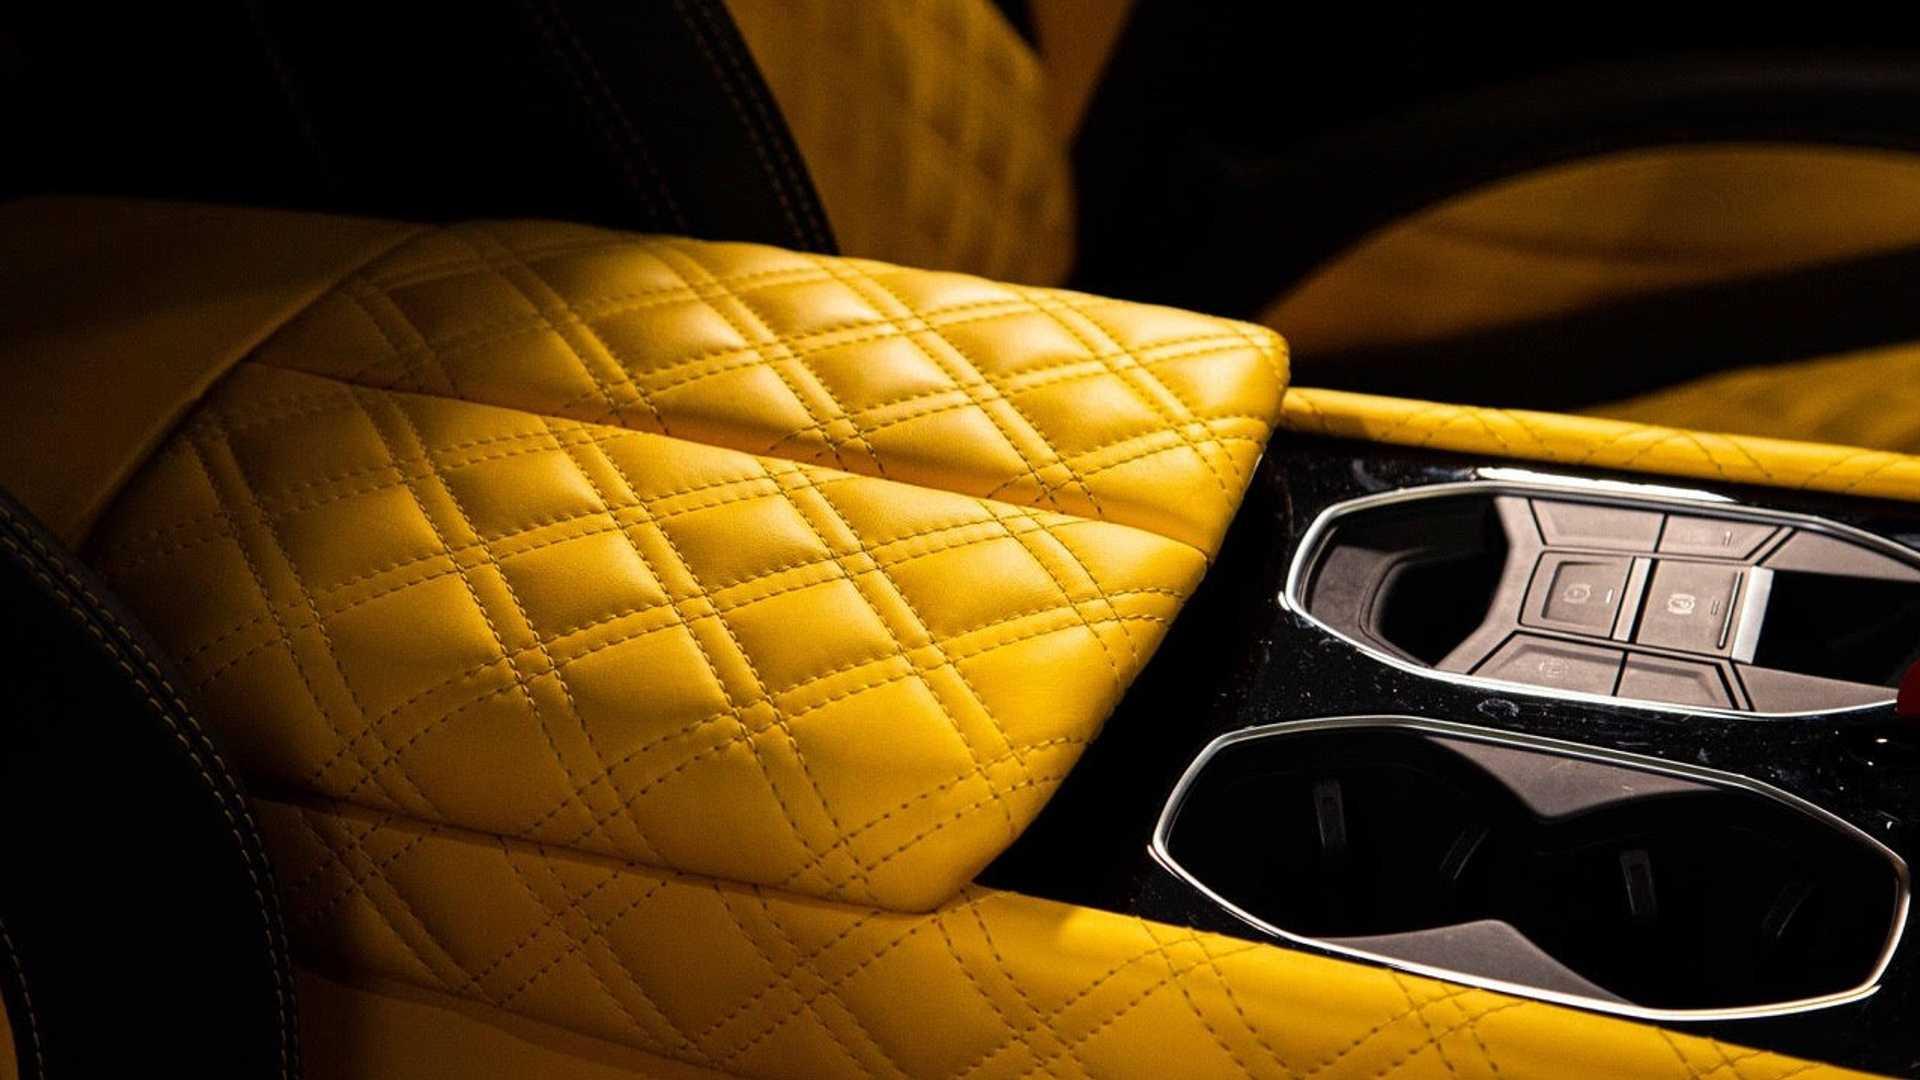 Lamborghini-Urus-by-Keyvany-19